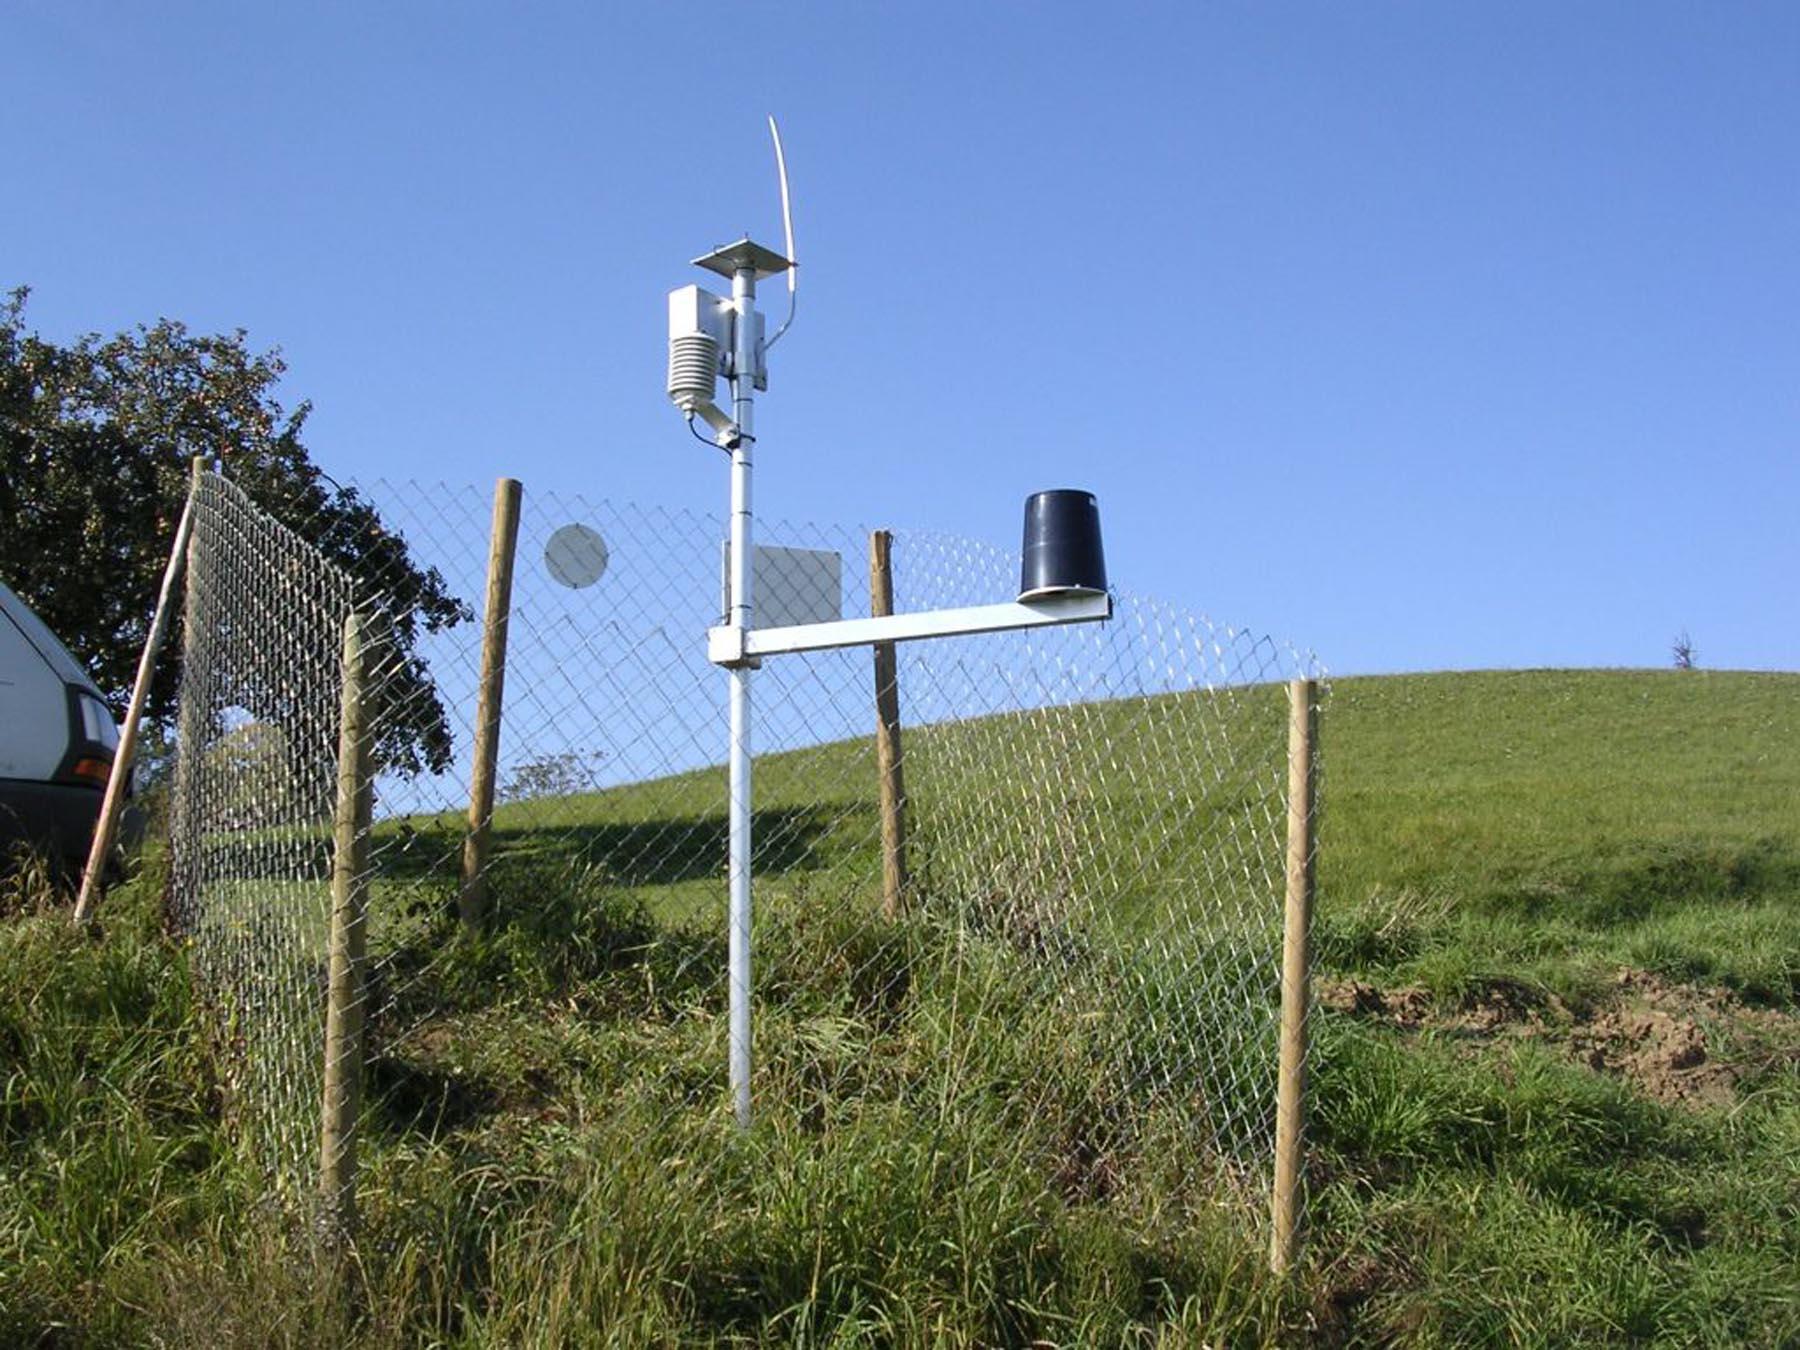 Messstation im Feldbachgebiet